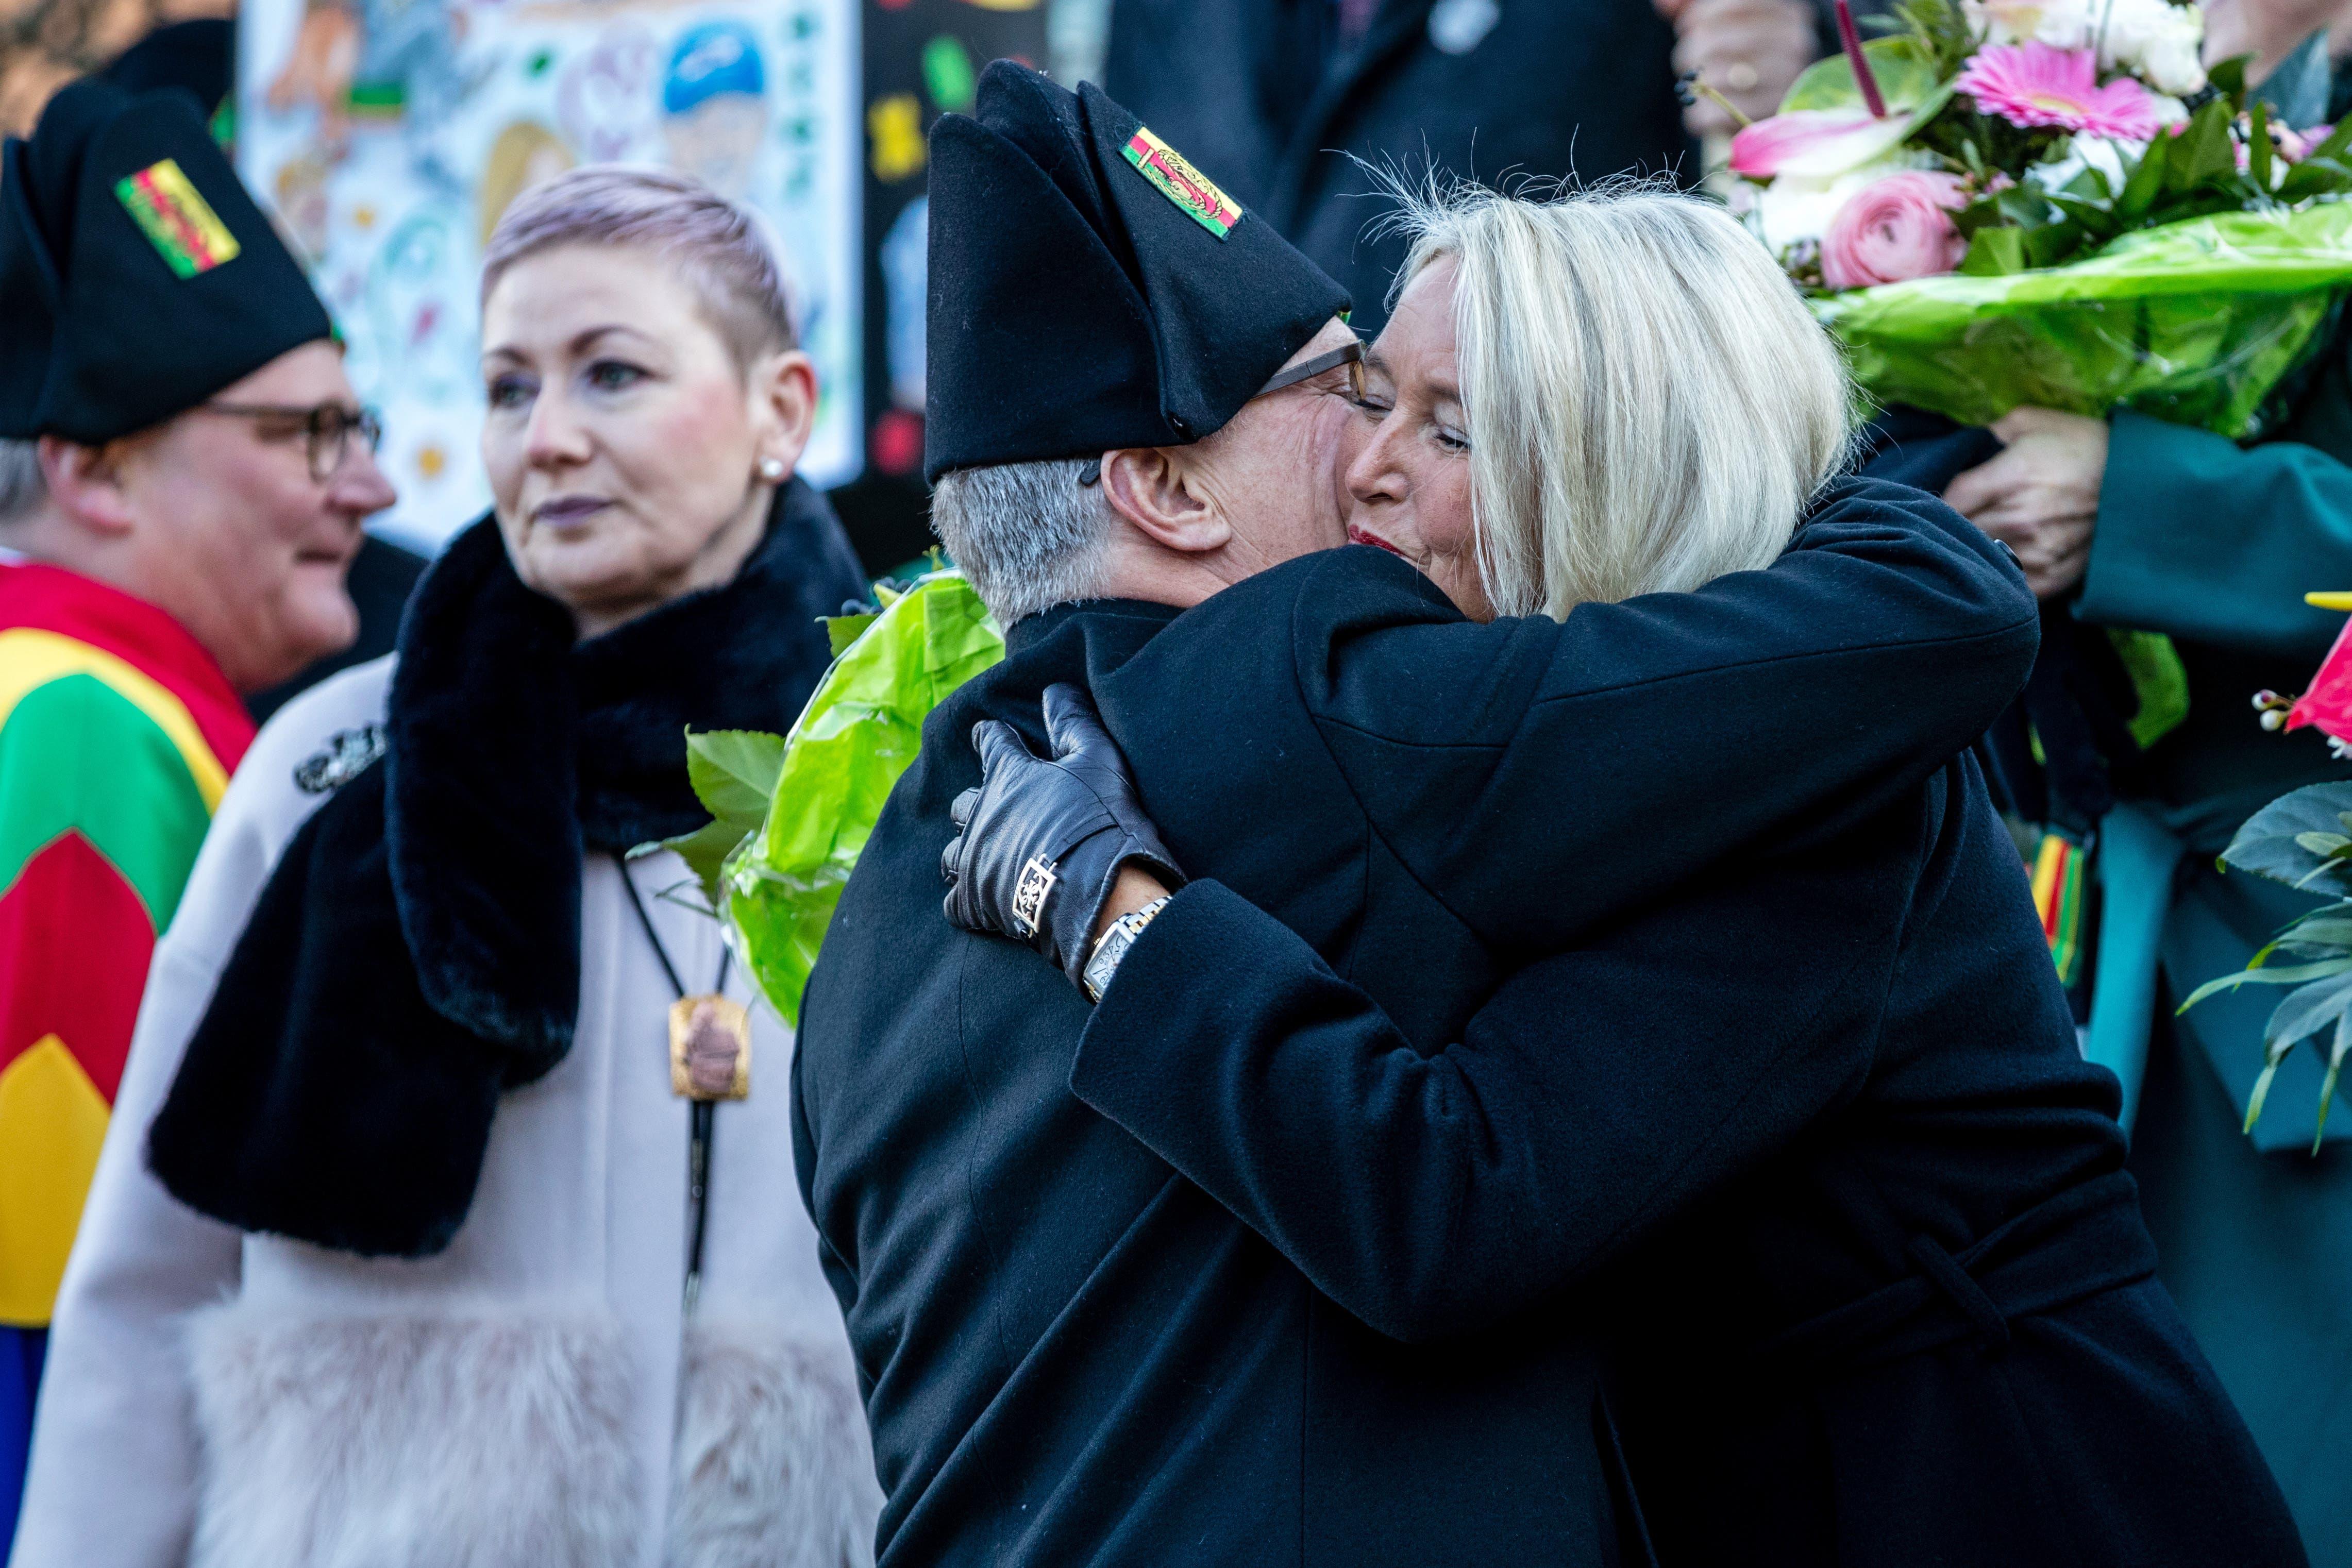 Gallivater Hugo Herzog umarmt seine Frau Lucette Oggier Herzog.